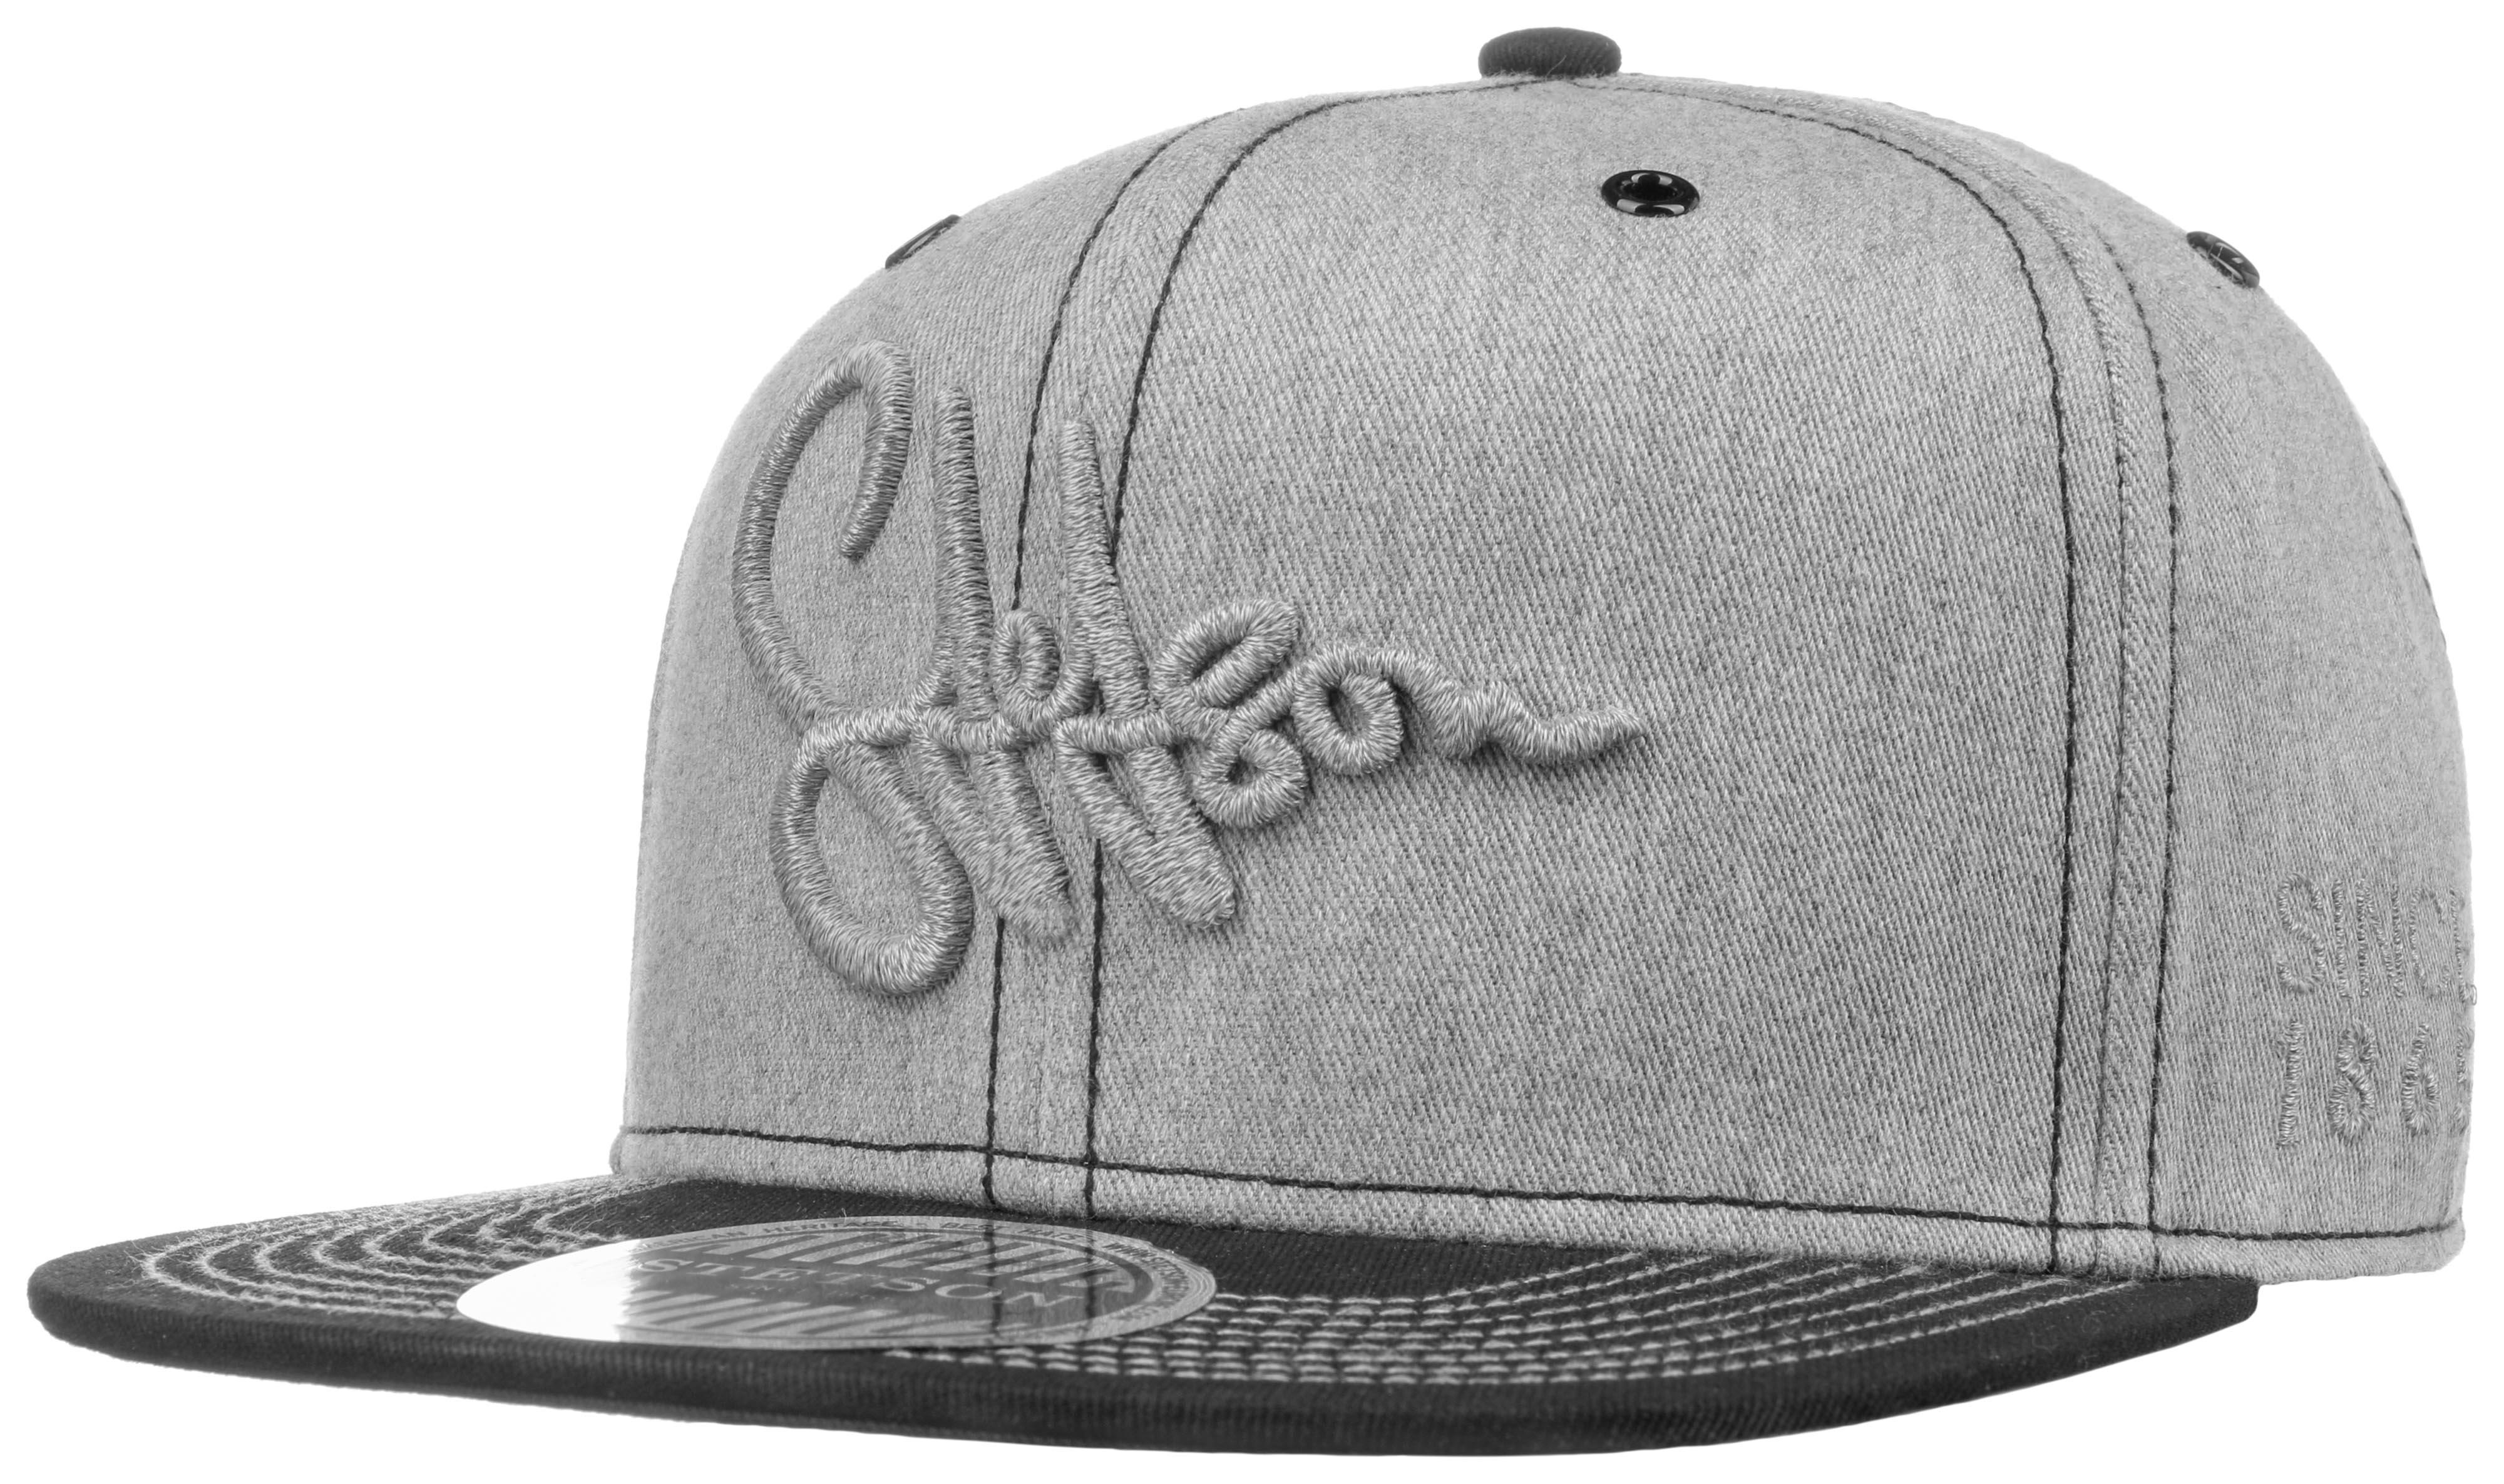 Stetson Snapback Cap Cotton